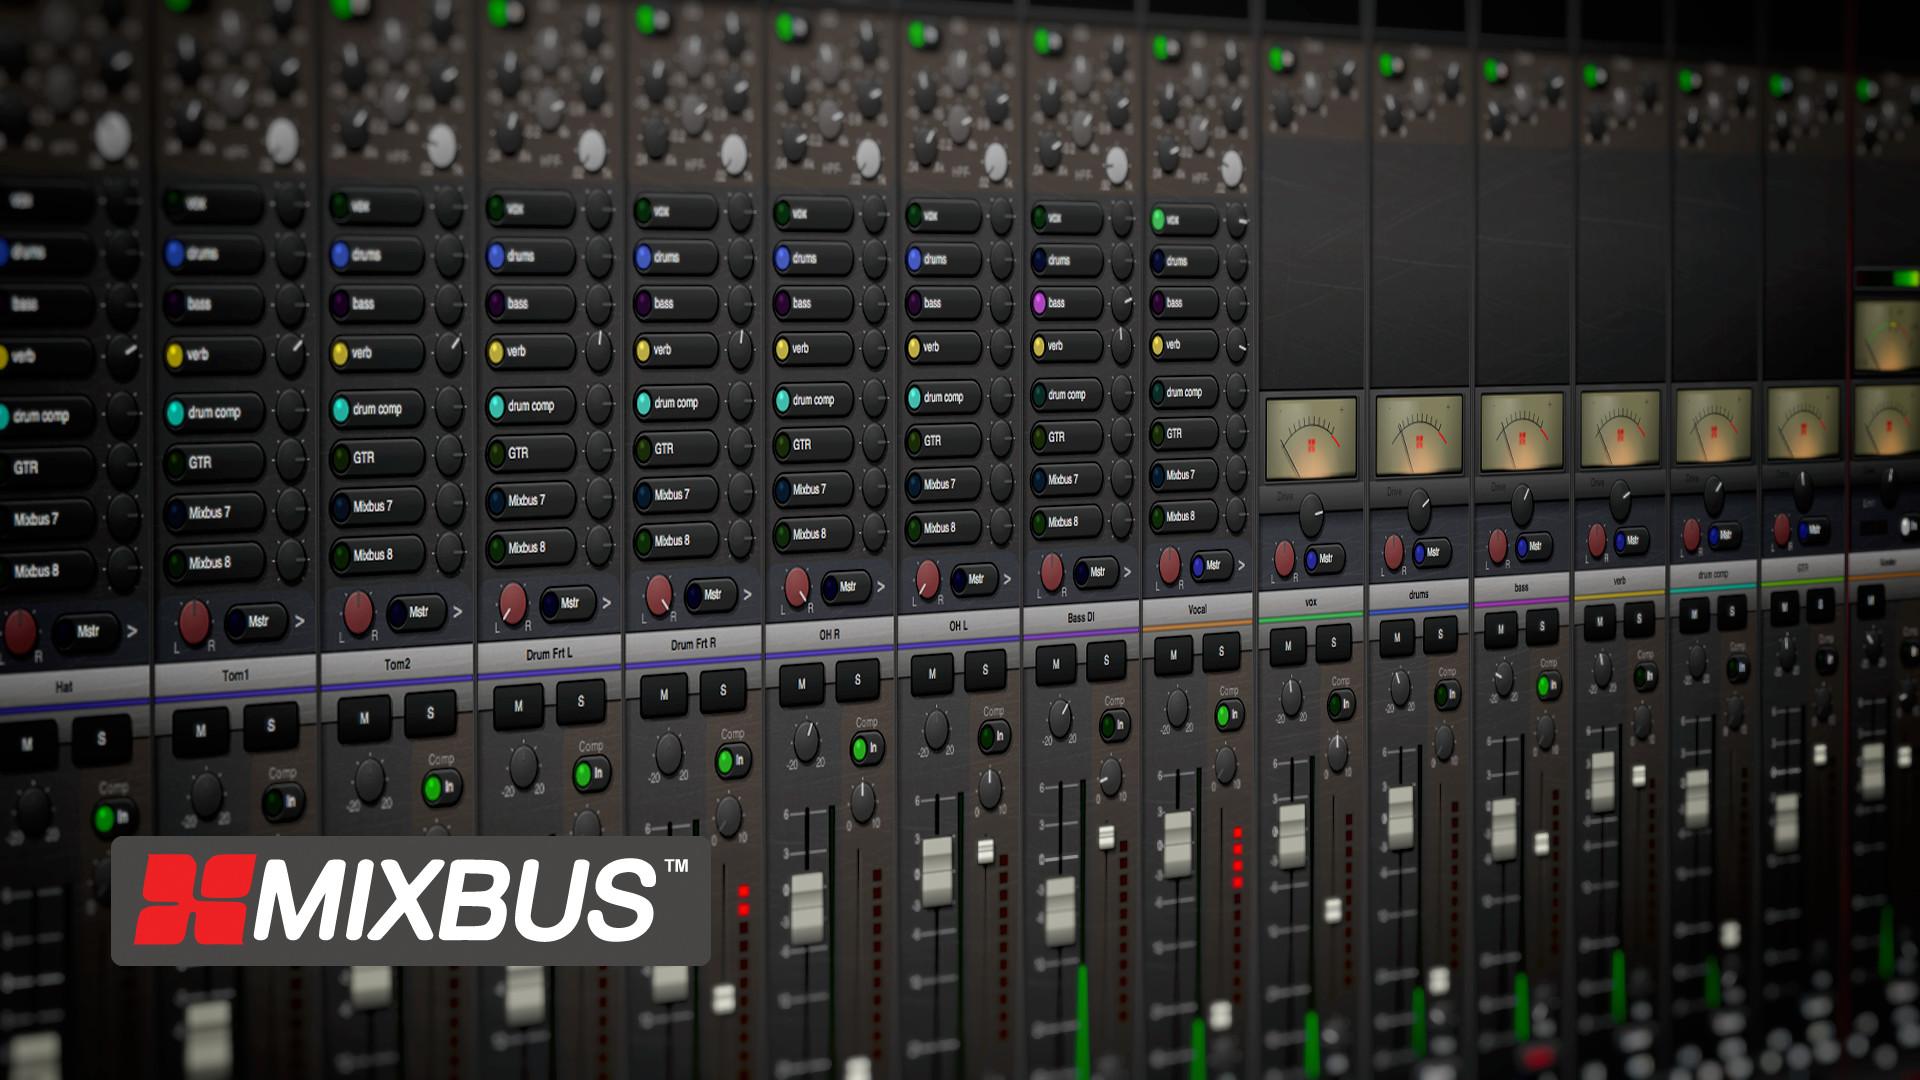 [Image: Mixbus%20desktop.png]